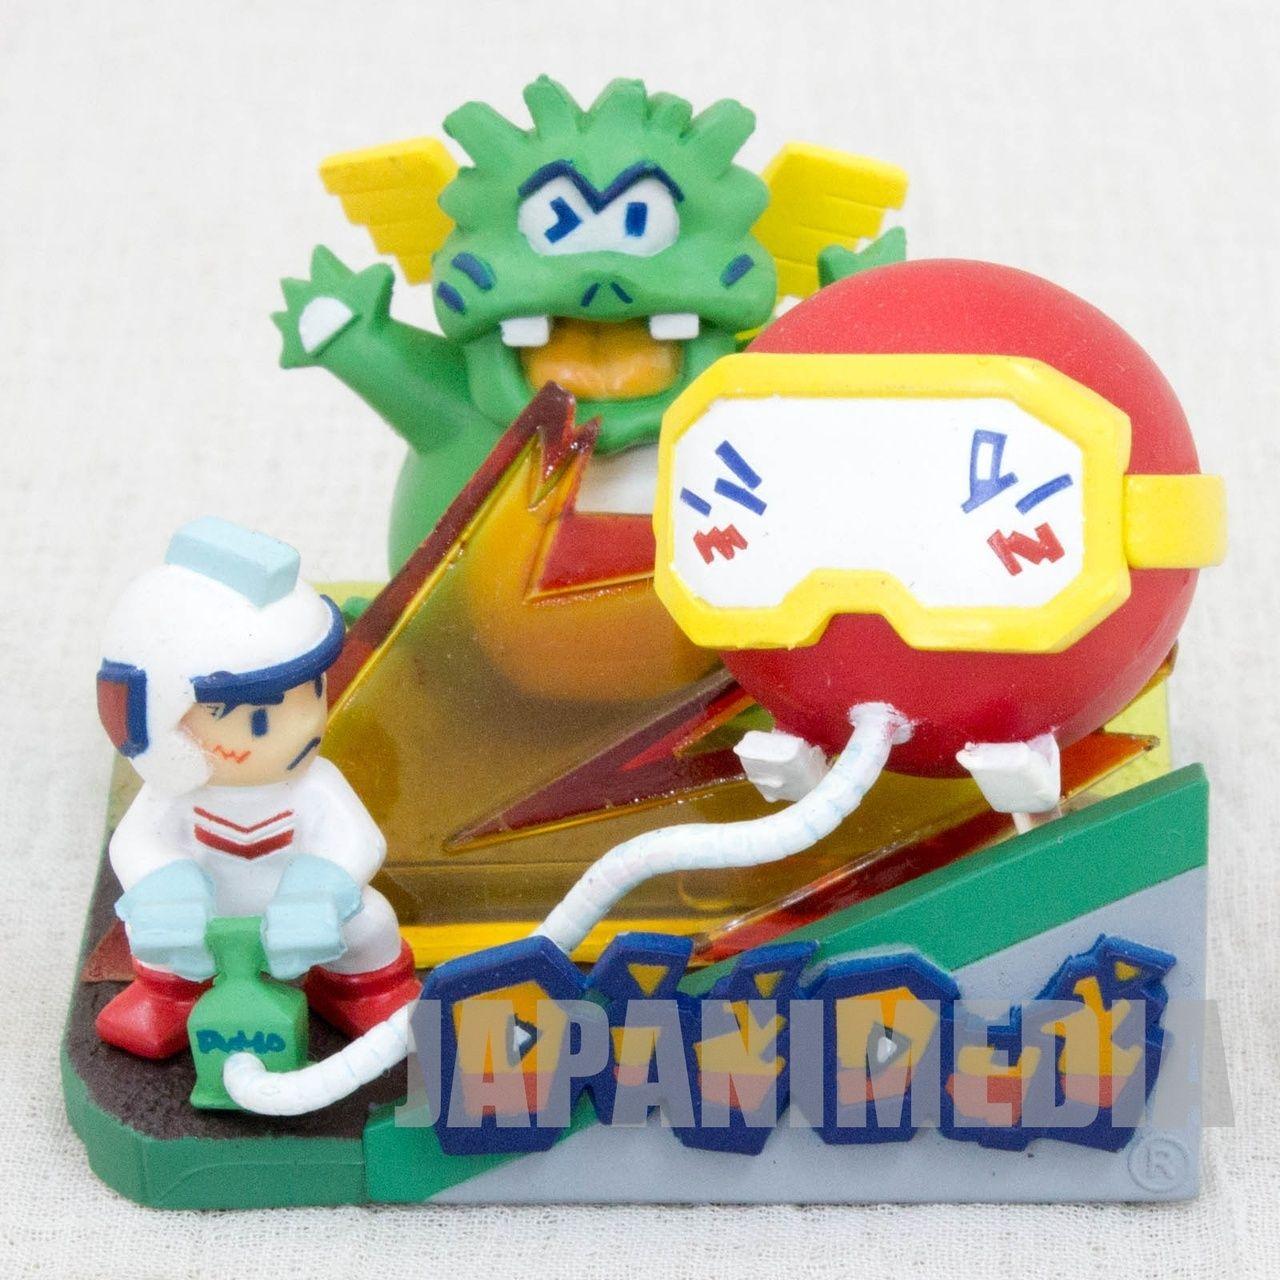 Rare Namcole Digdug Package Type Mini Figure Namco Japan Nes